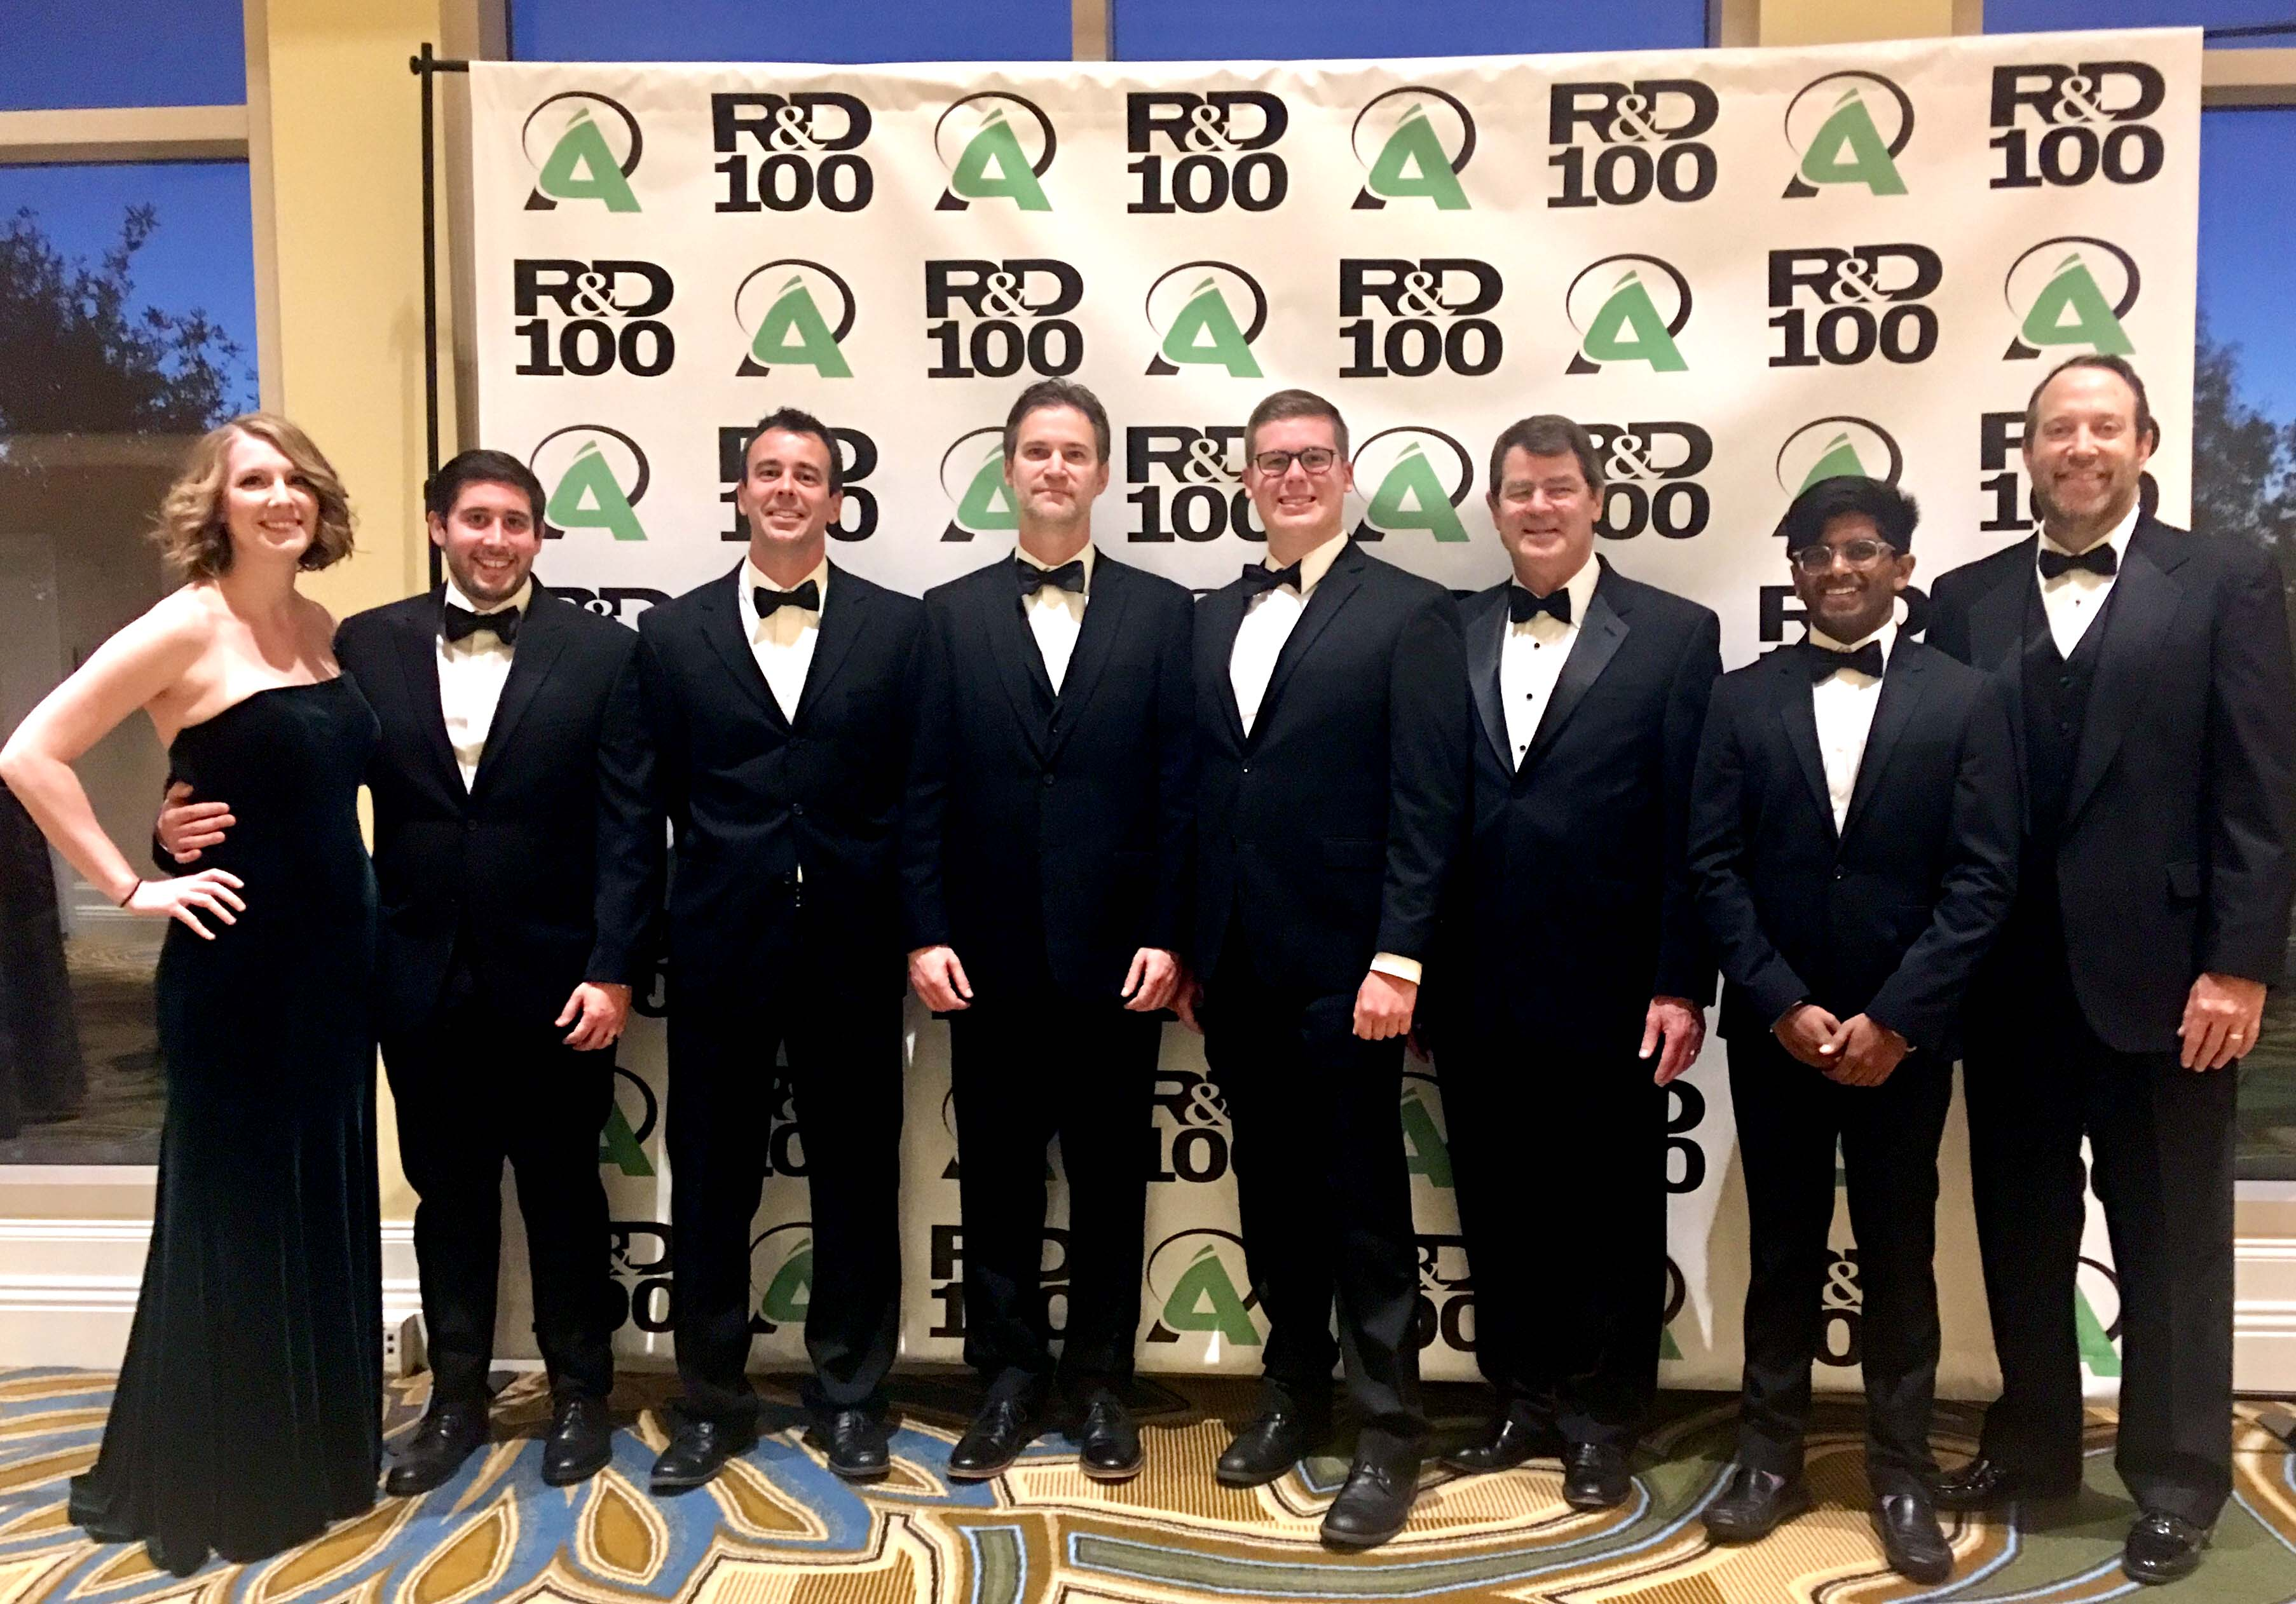 ThreatSEQ team receiving R&D 100 Award